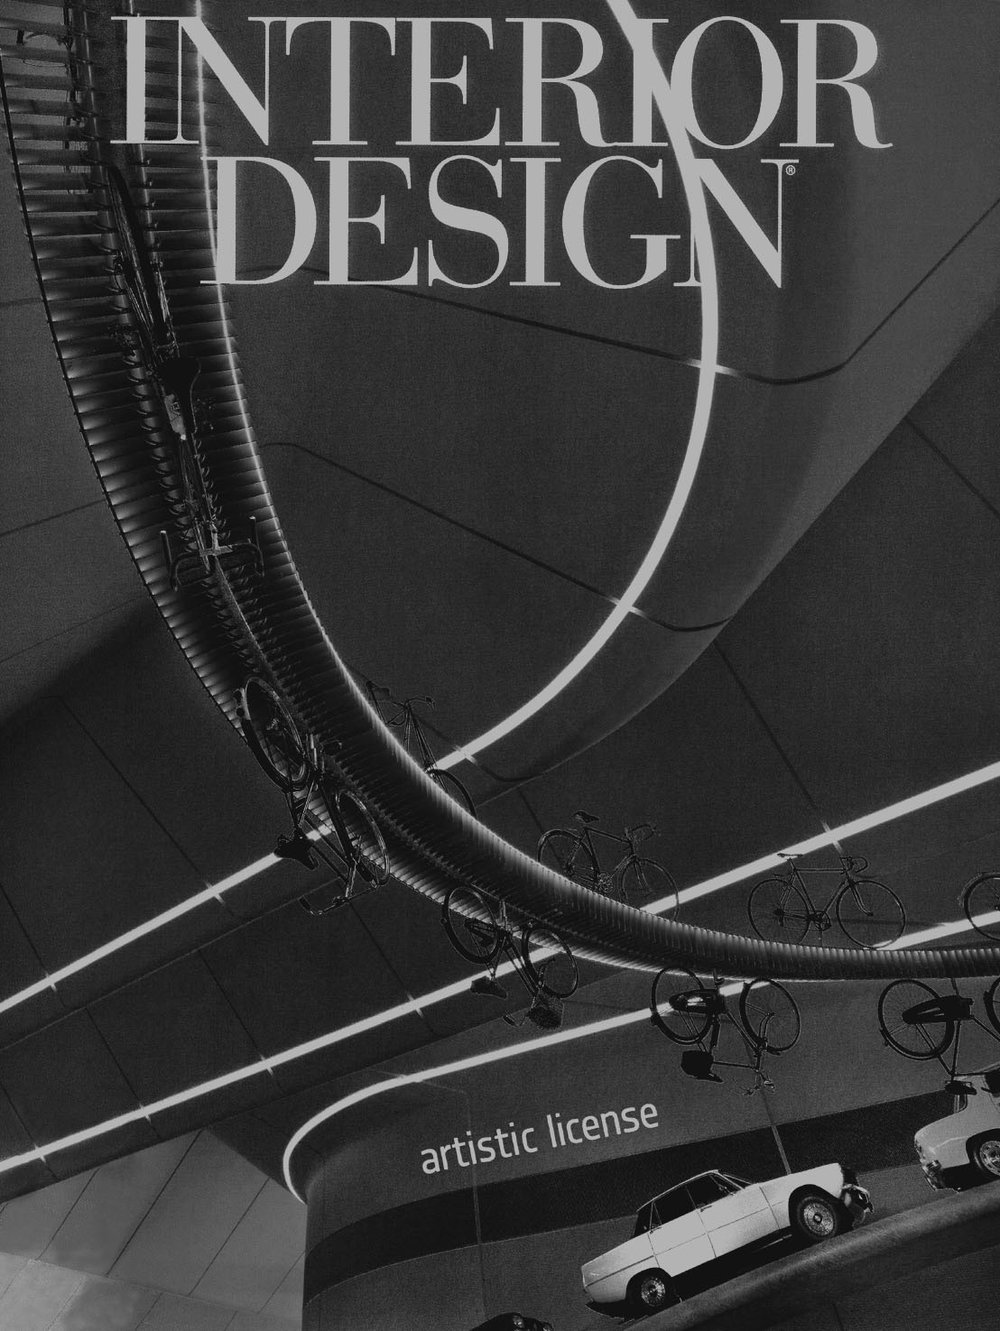 Established Hotel Design Firms NY,NY | Joe Ginsberg Design